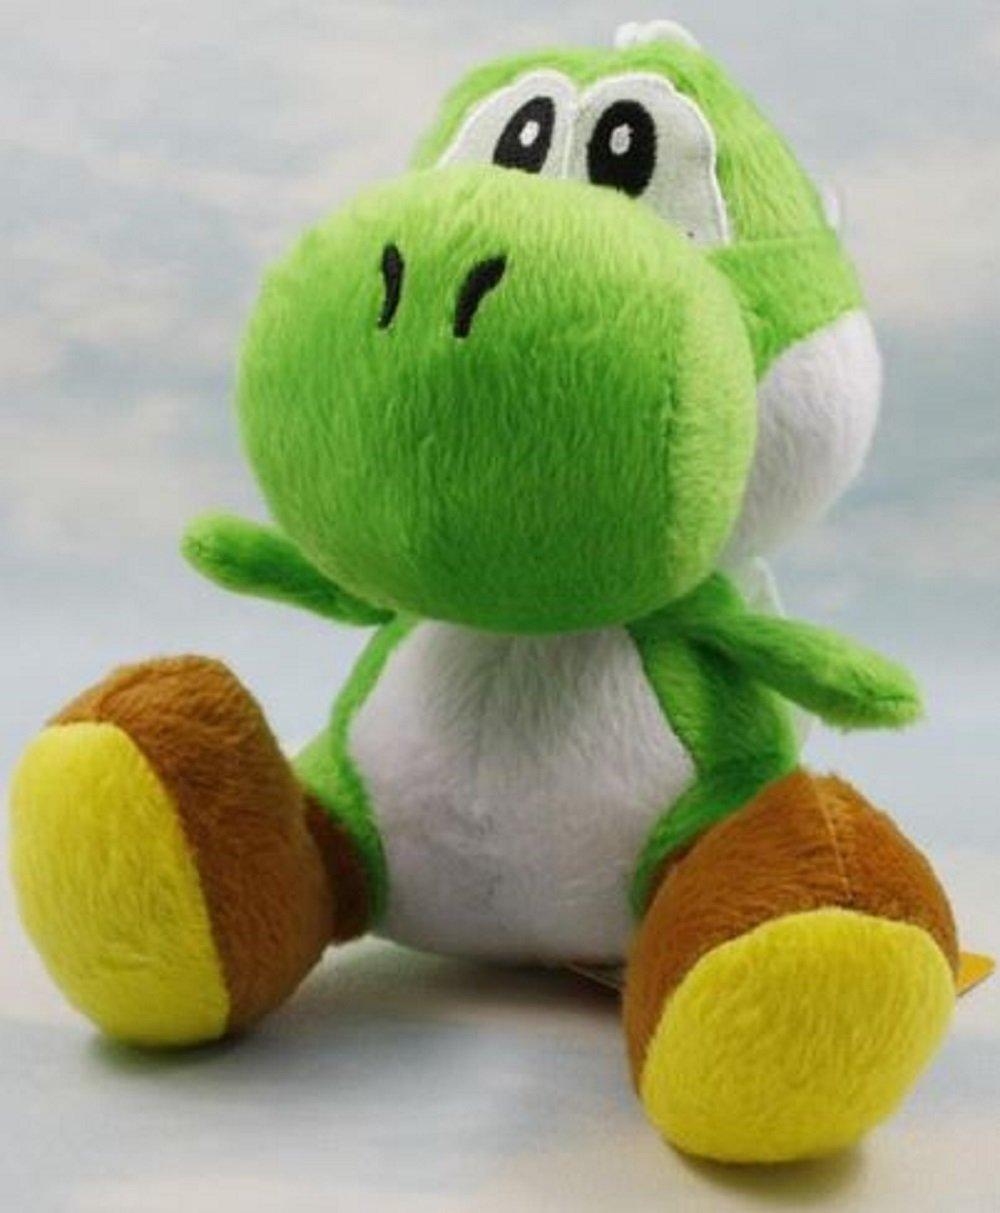 Green 6 Inch Plush Yoshi Doll, Generic by Generic